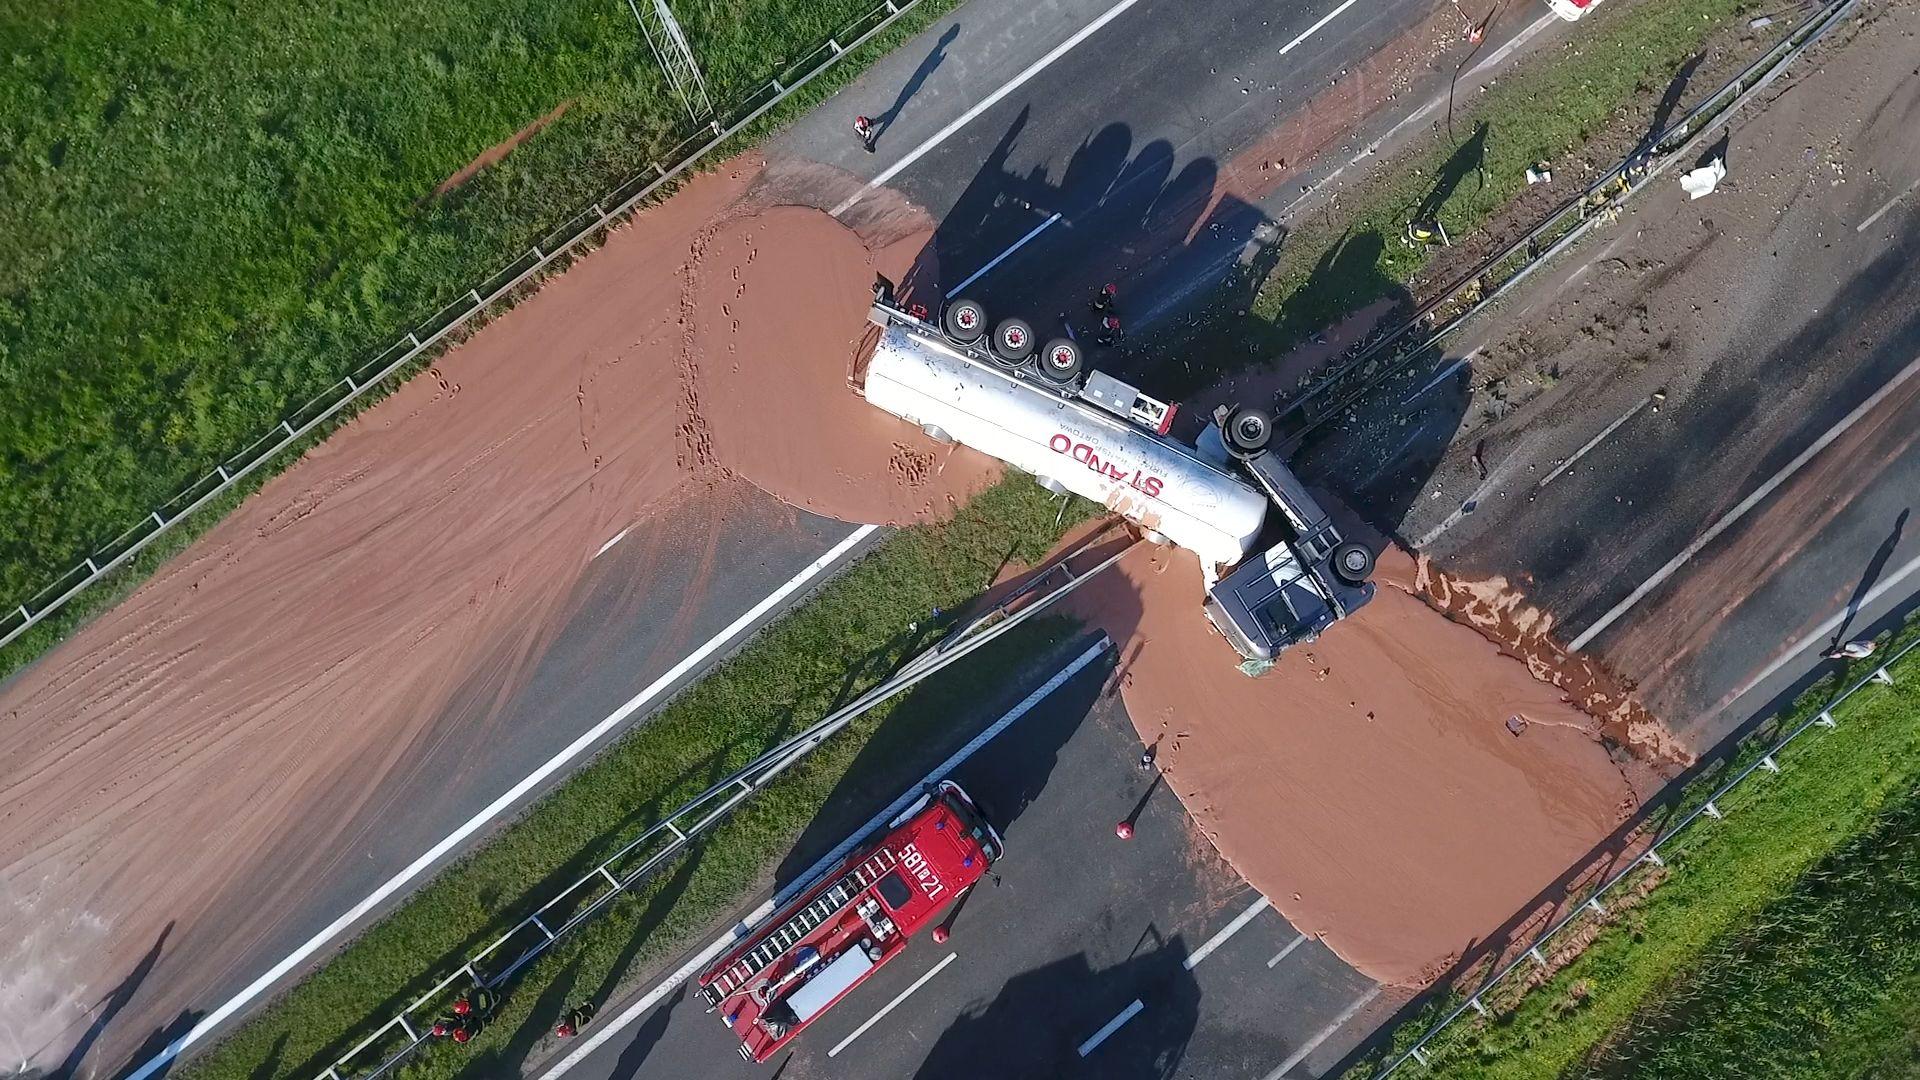 05_09_Poland_chocolate_spill